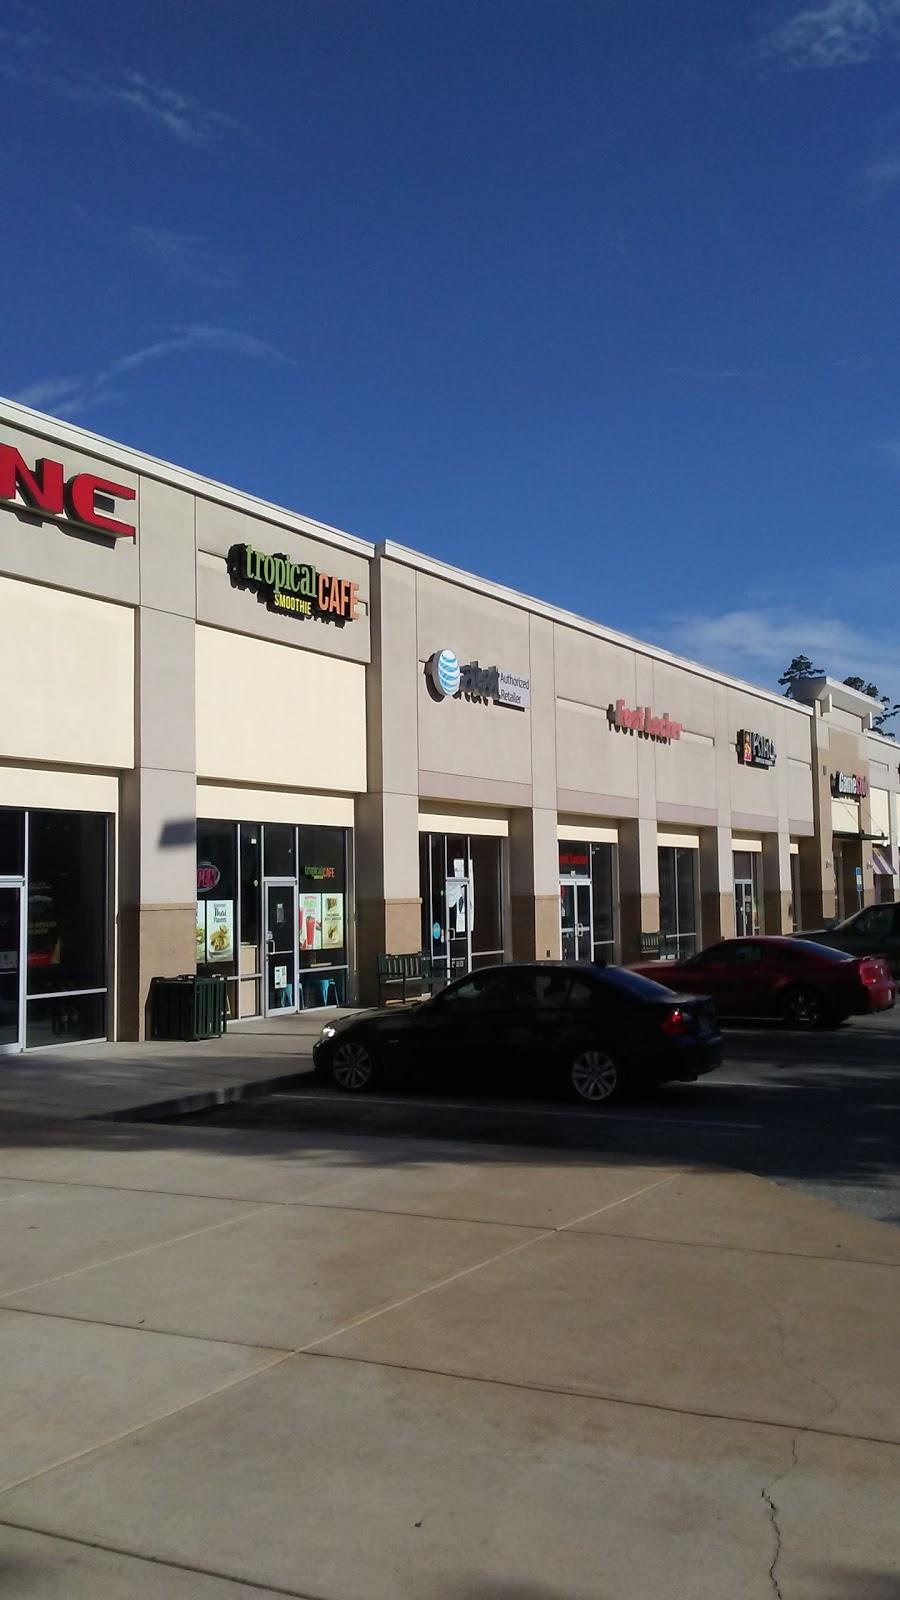 Ocala Corners | shopping mall | 800 Ocala Rd, Tallahassee, FL 32304, USA | 8136644800 OR +1 813-664-4800